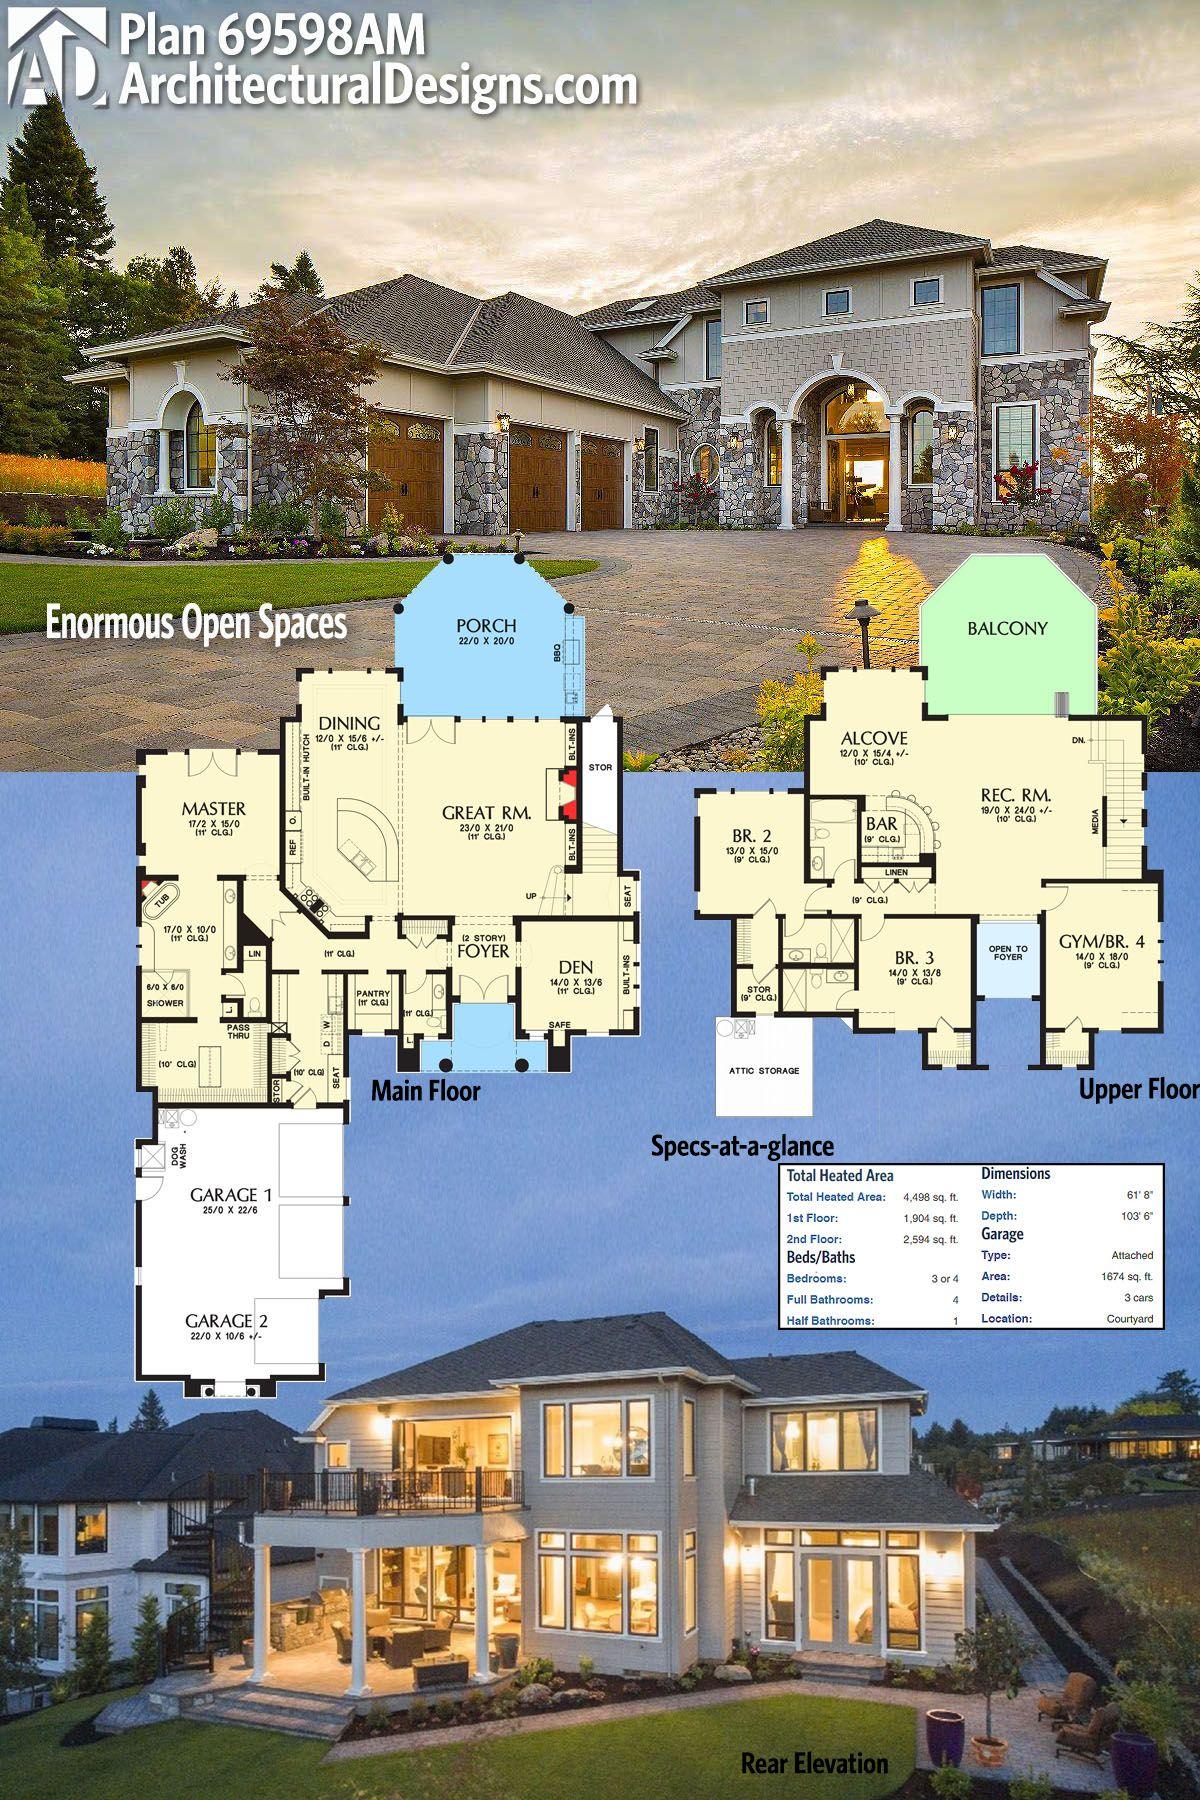 Plan 69598AM: Enormous Open Spaces | Floor Plans in 2019 ...